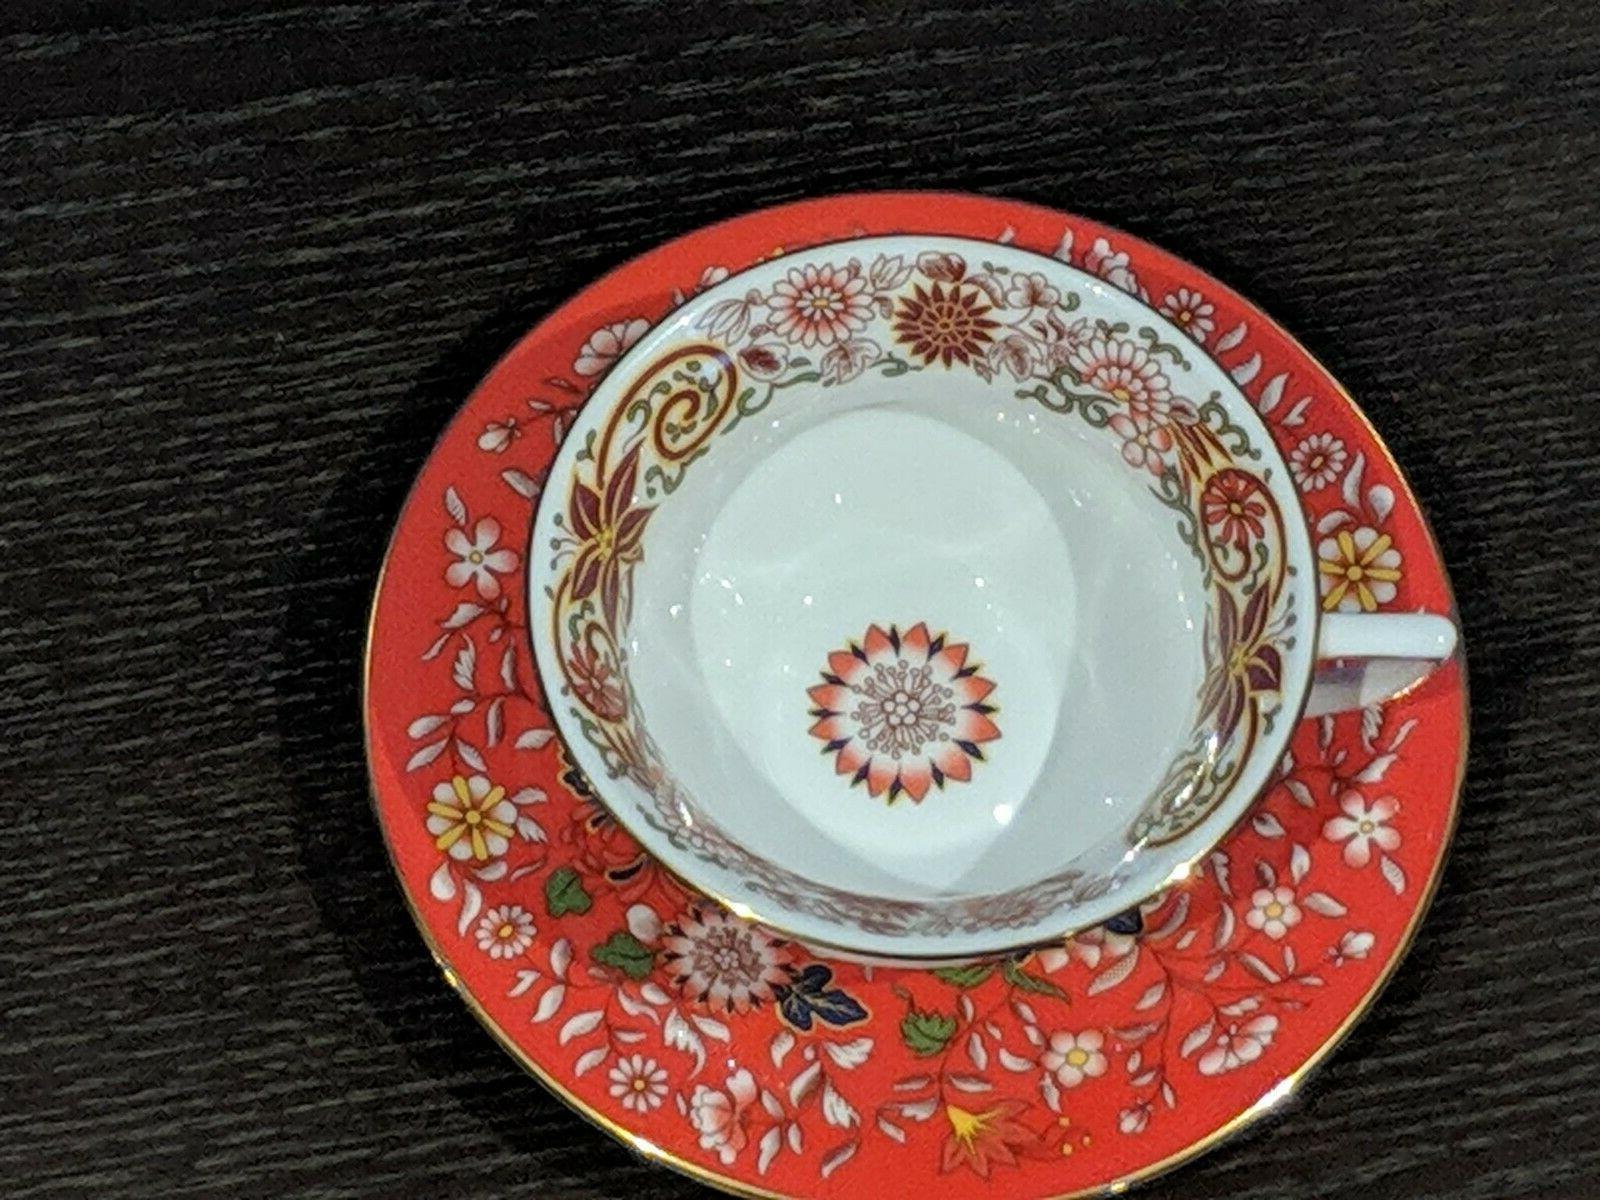 crimson orient tea cup and saucer set